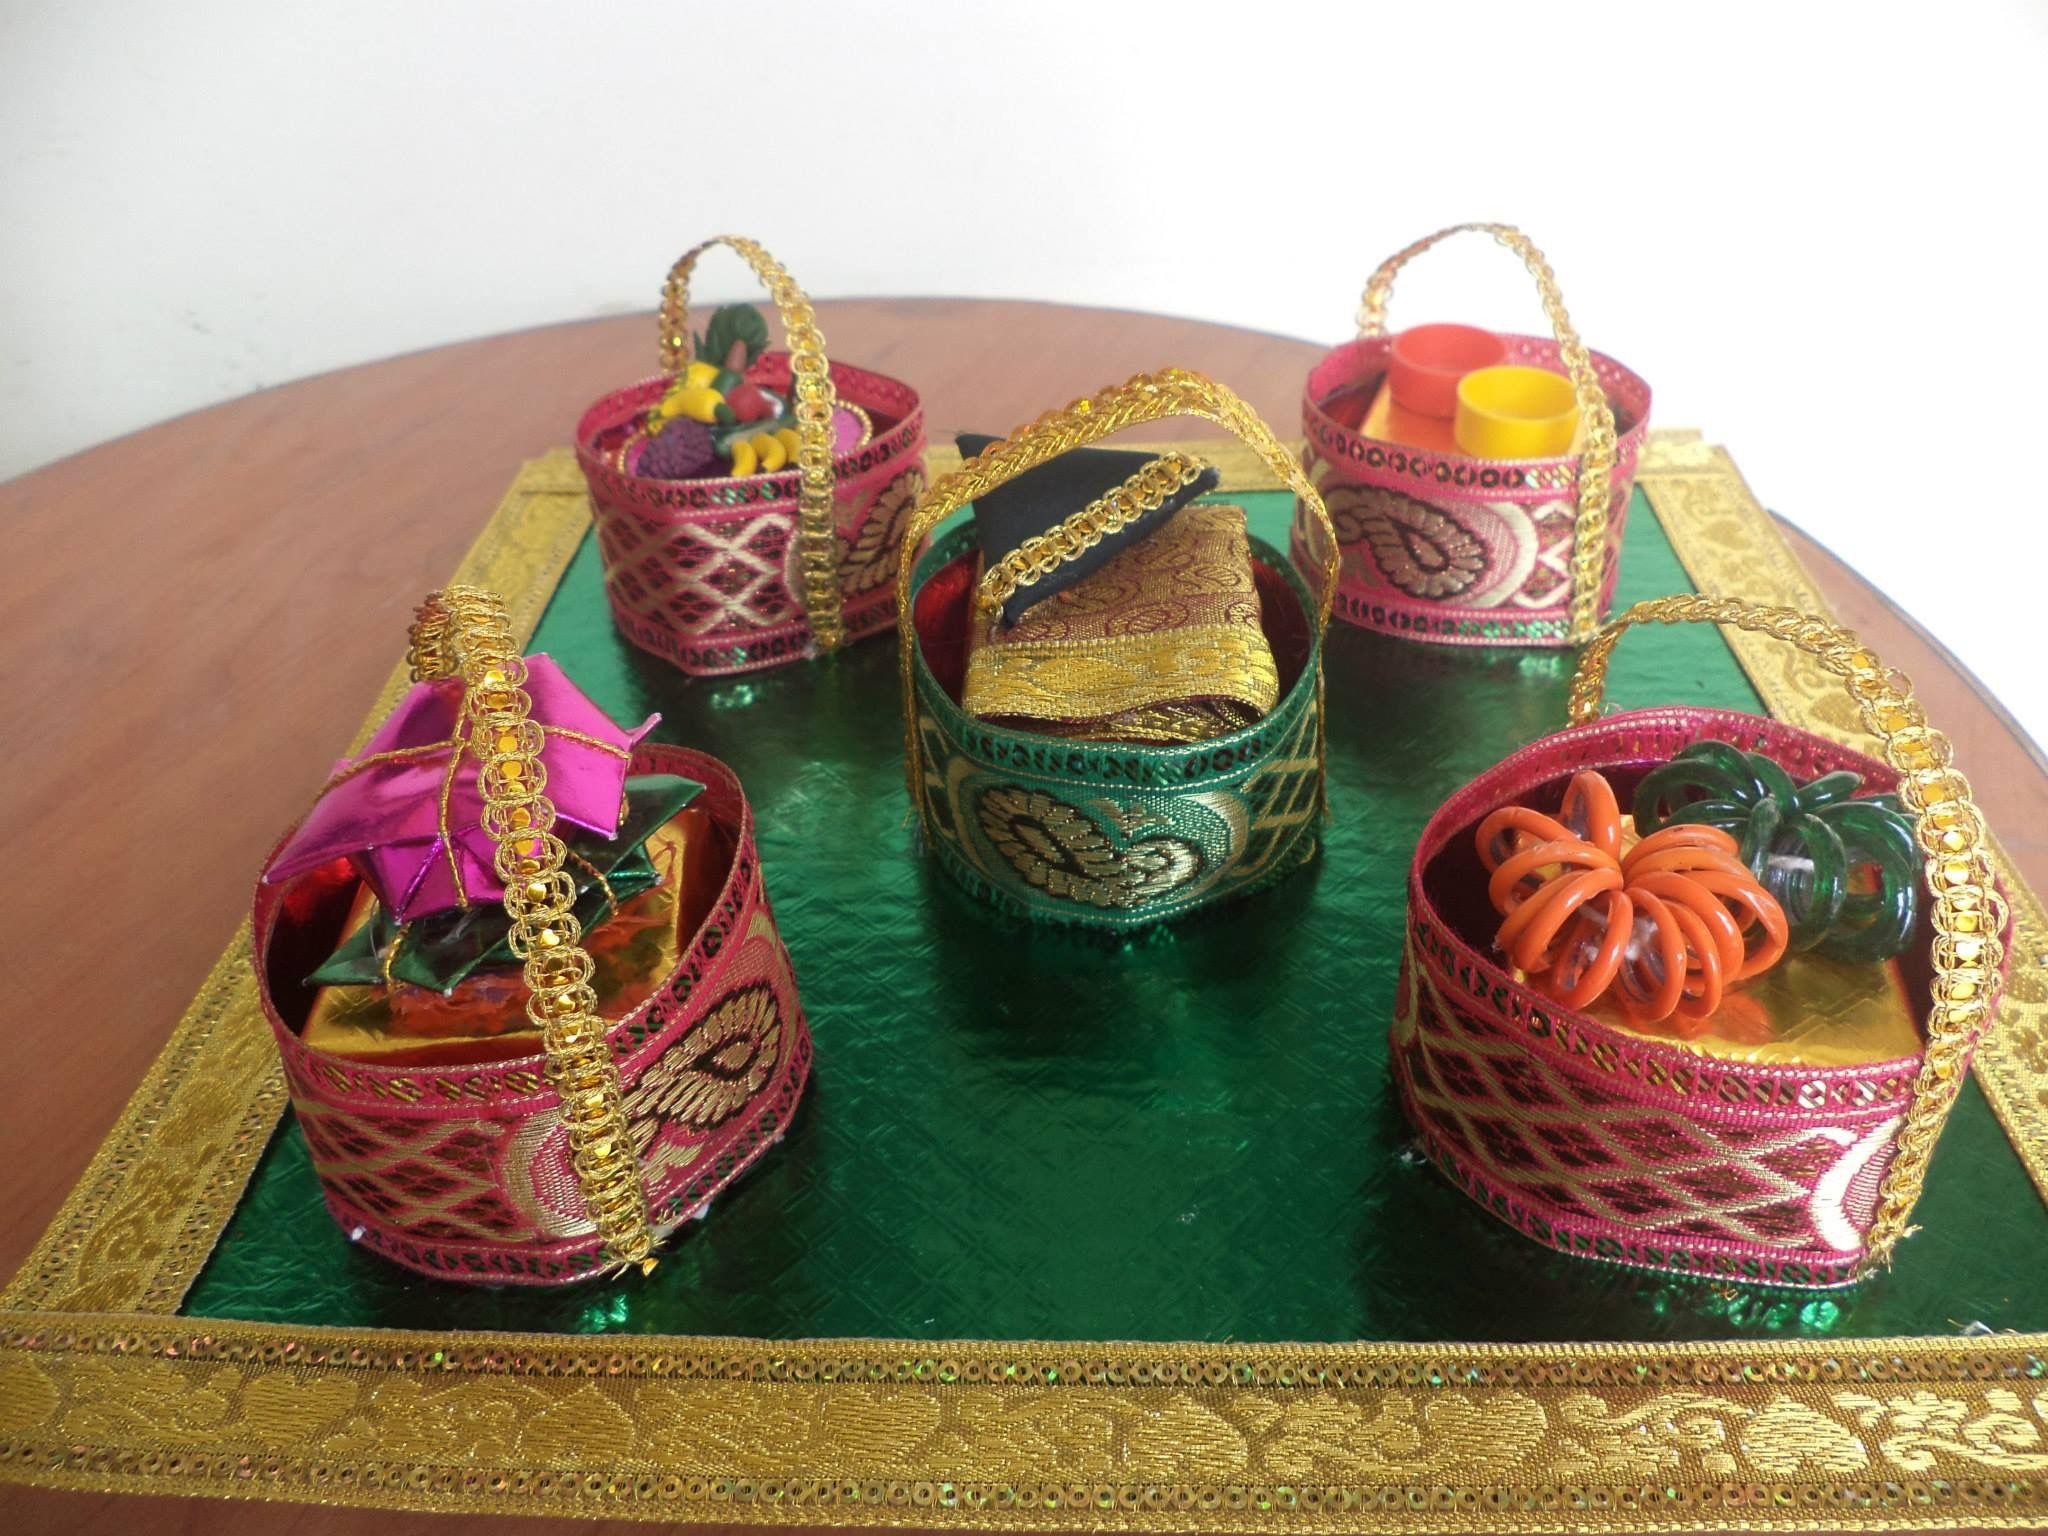 Pin by asha latha on bellam achu decor pinterest for Baby tray decoration